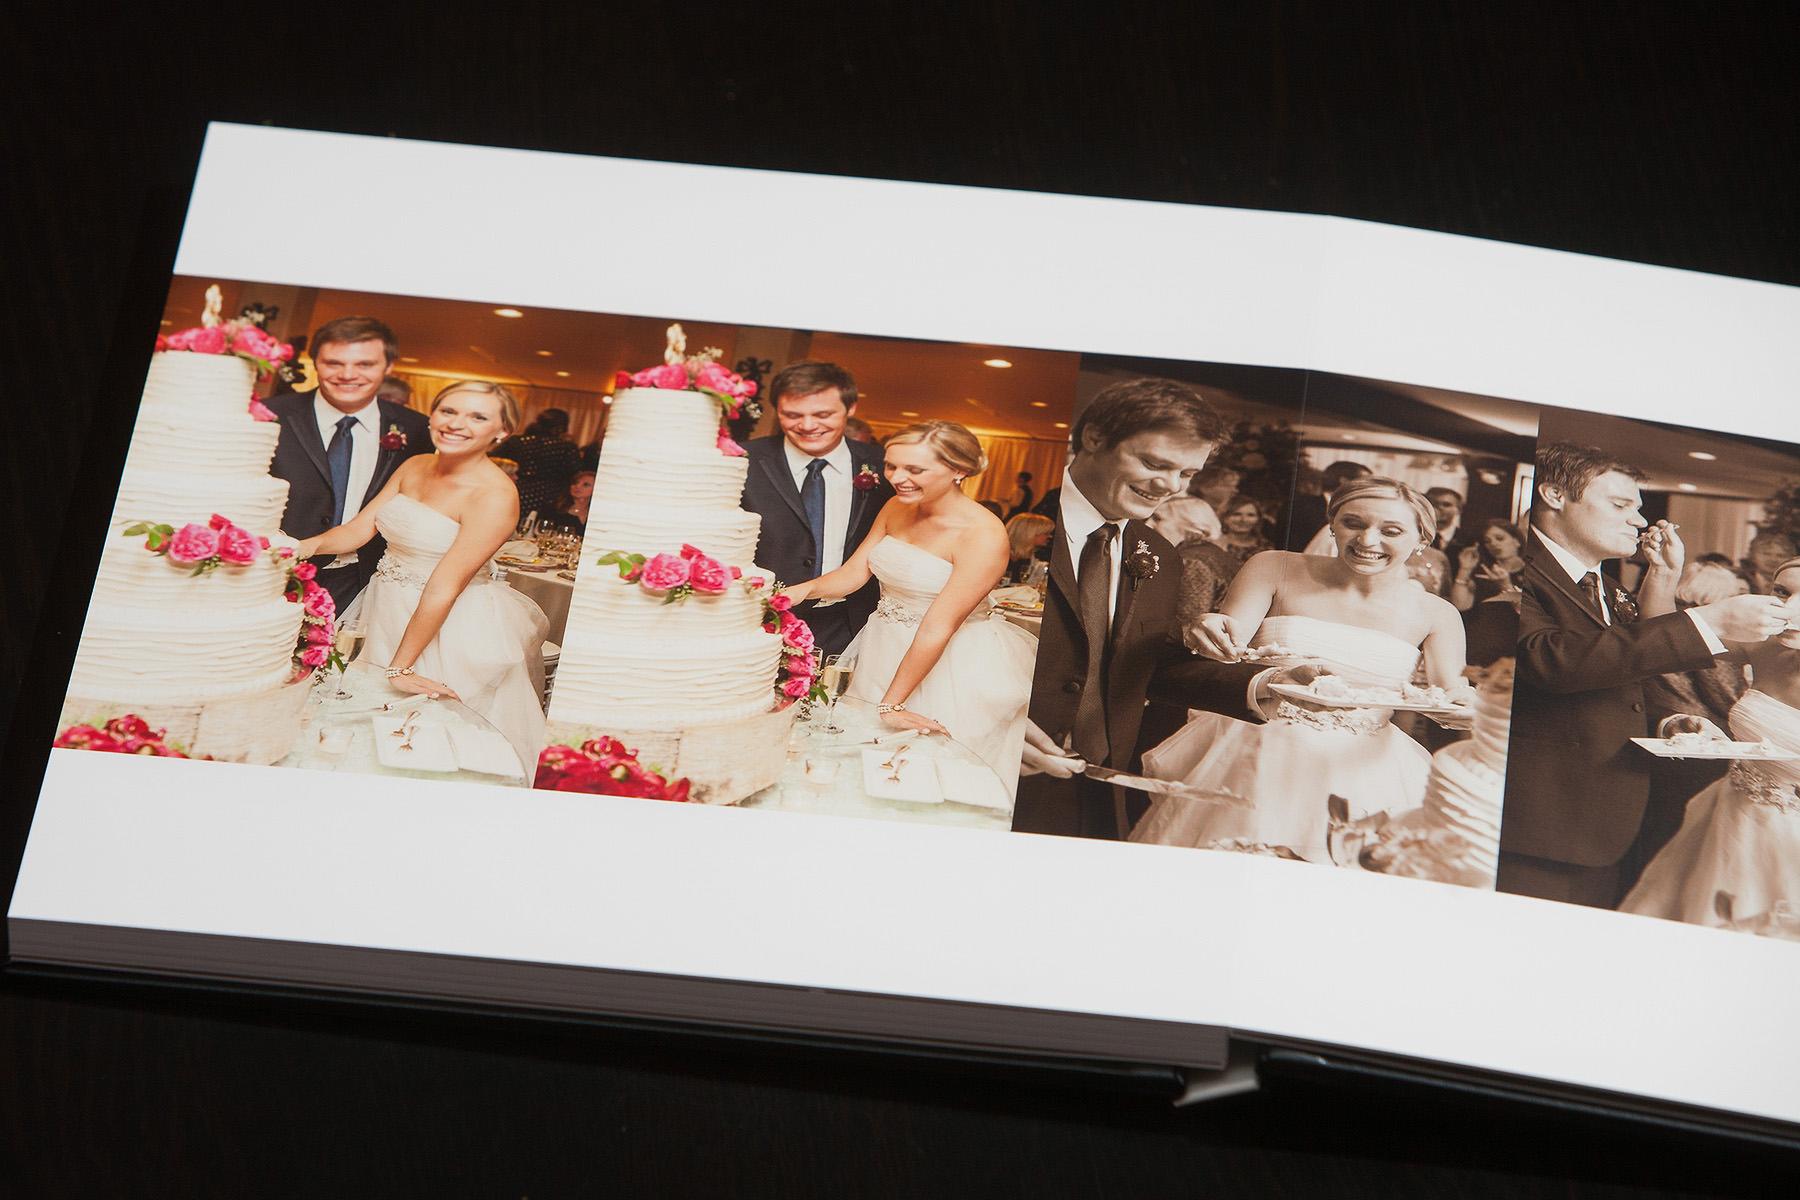 layflat-wedding-album